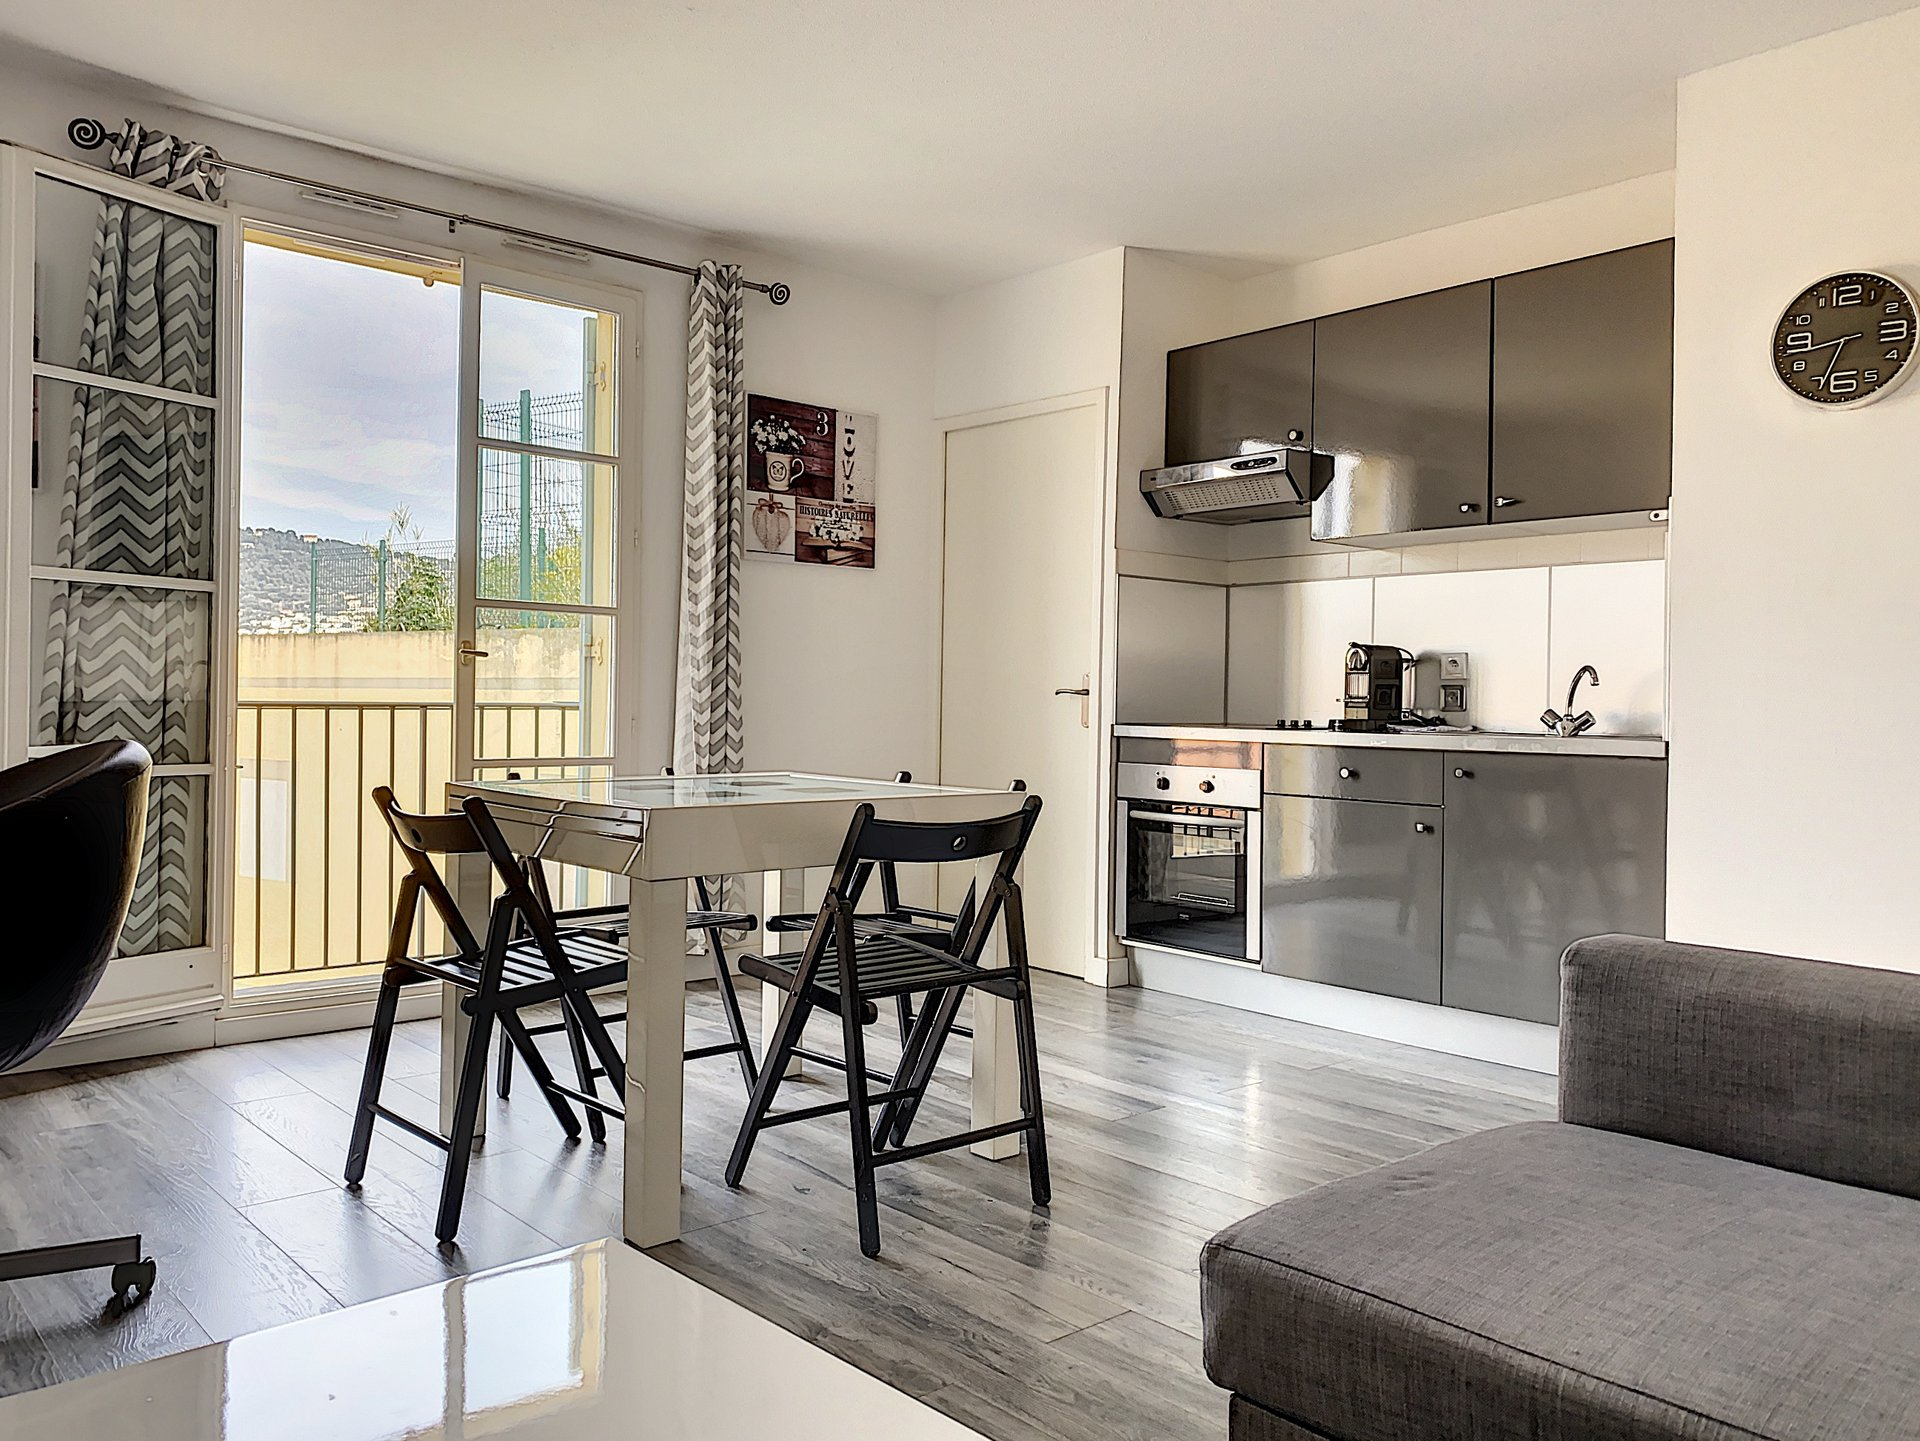 Appartement - NICE - 06300 - 1 chambre - 2 pièces